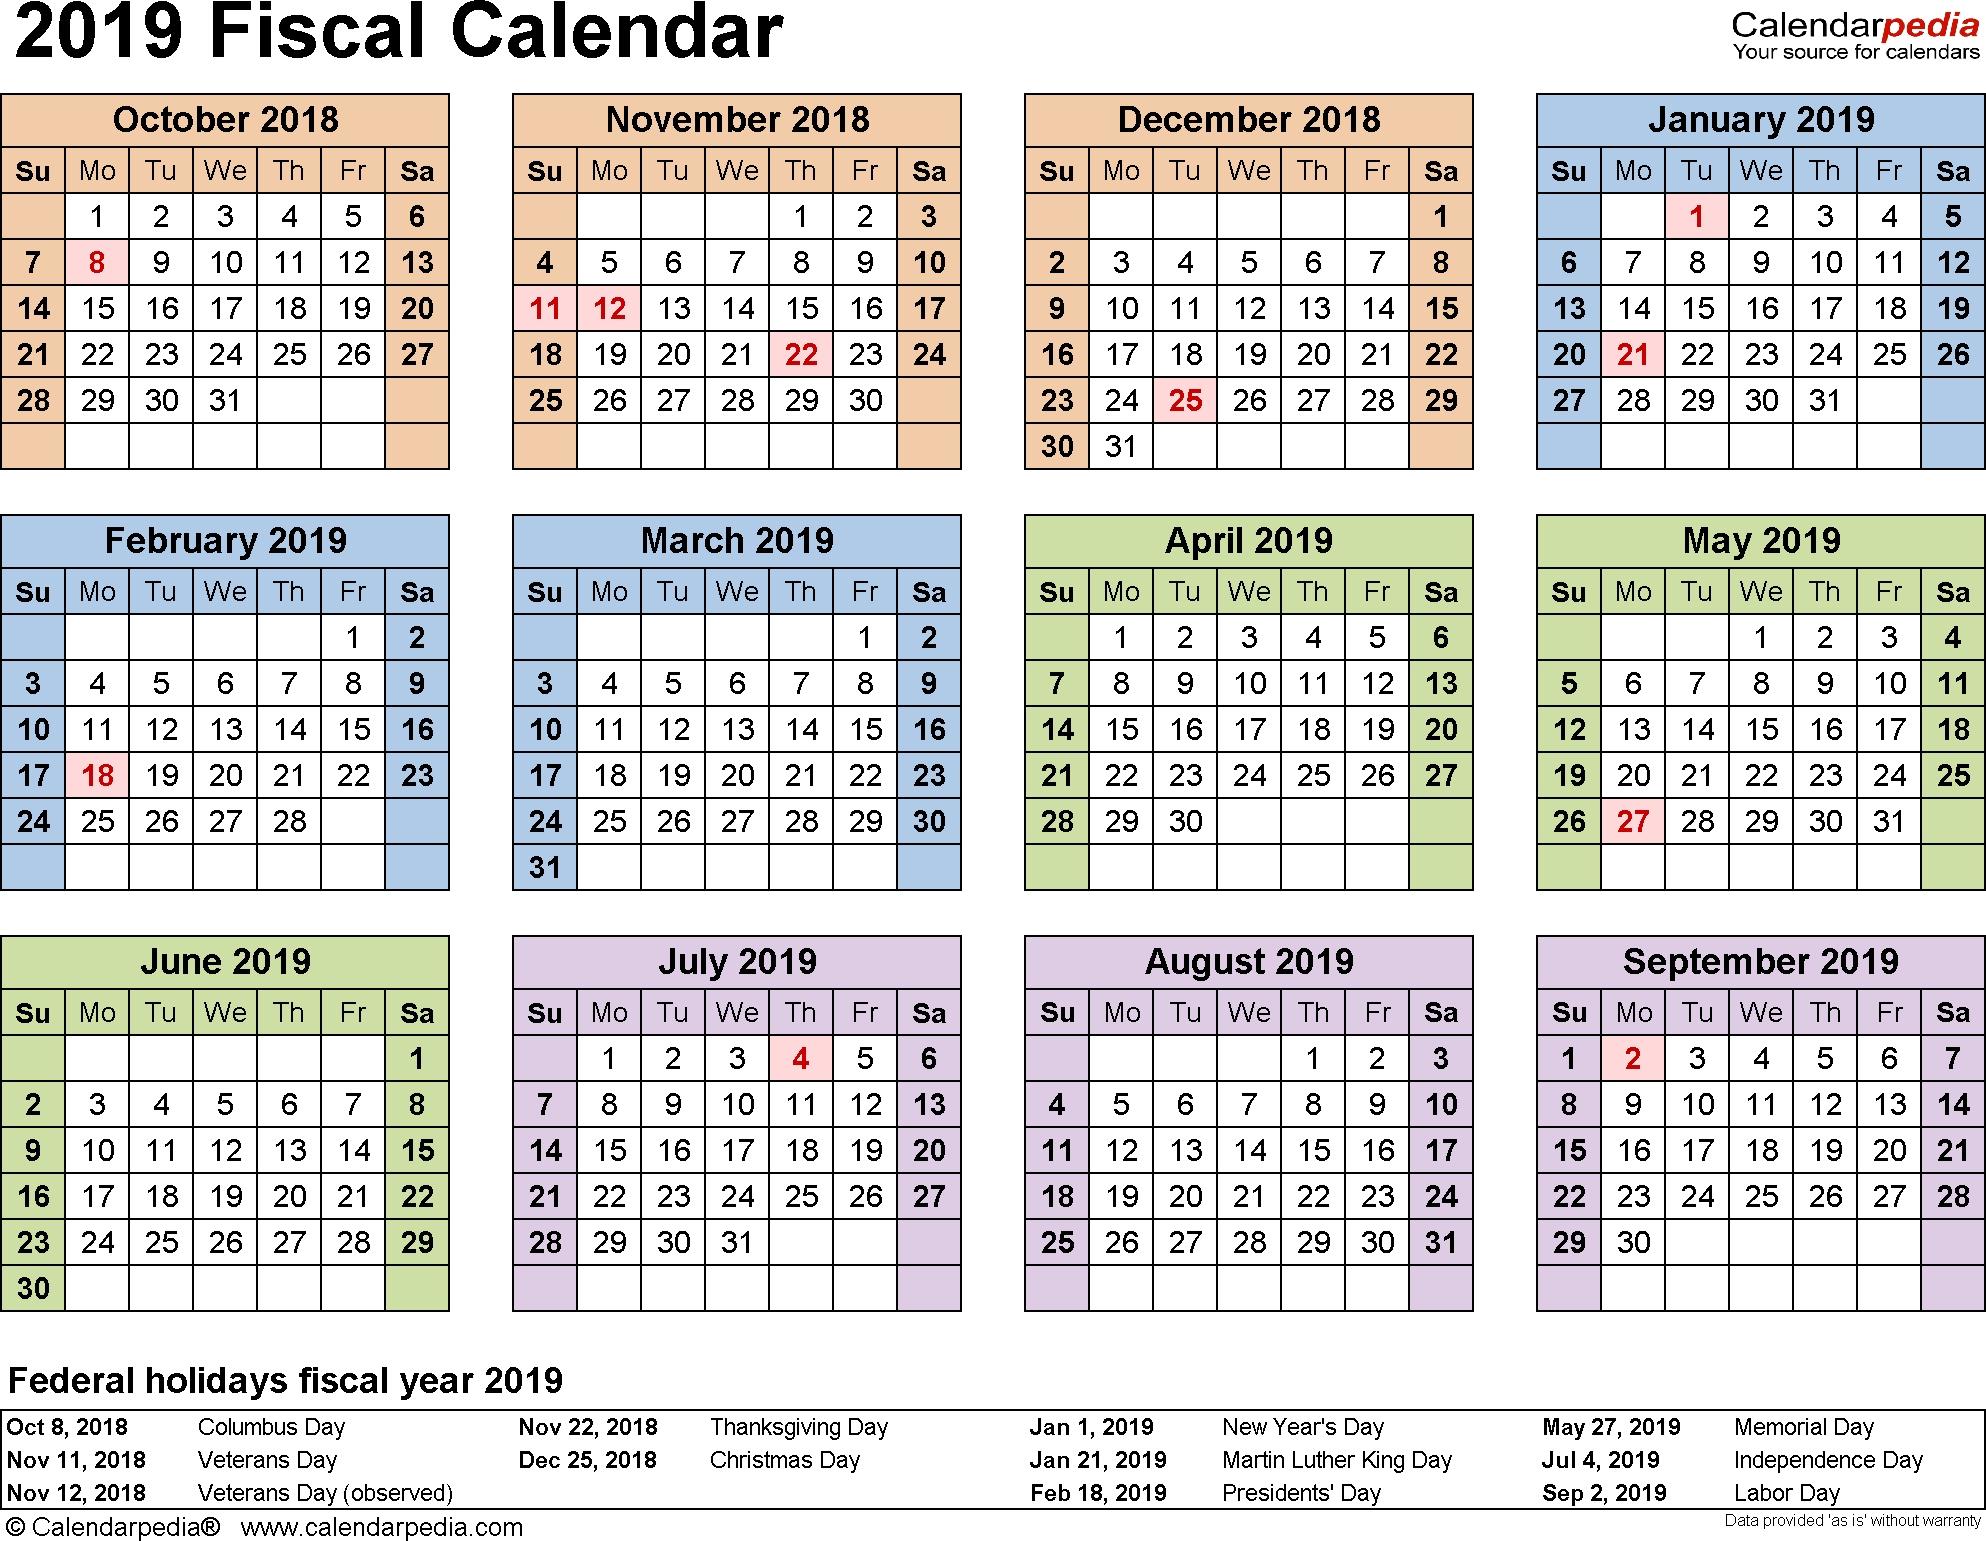 9/80 Calendar 2019 | Free Printable Calendar